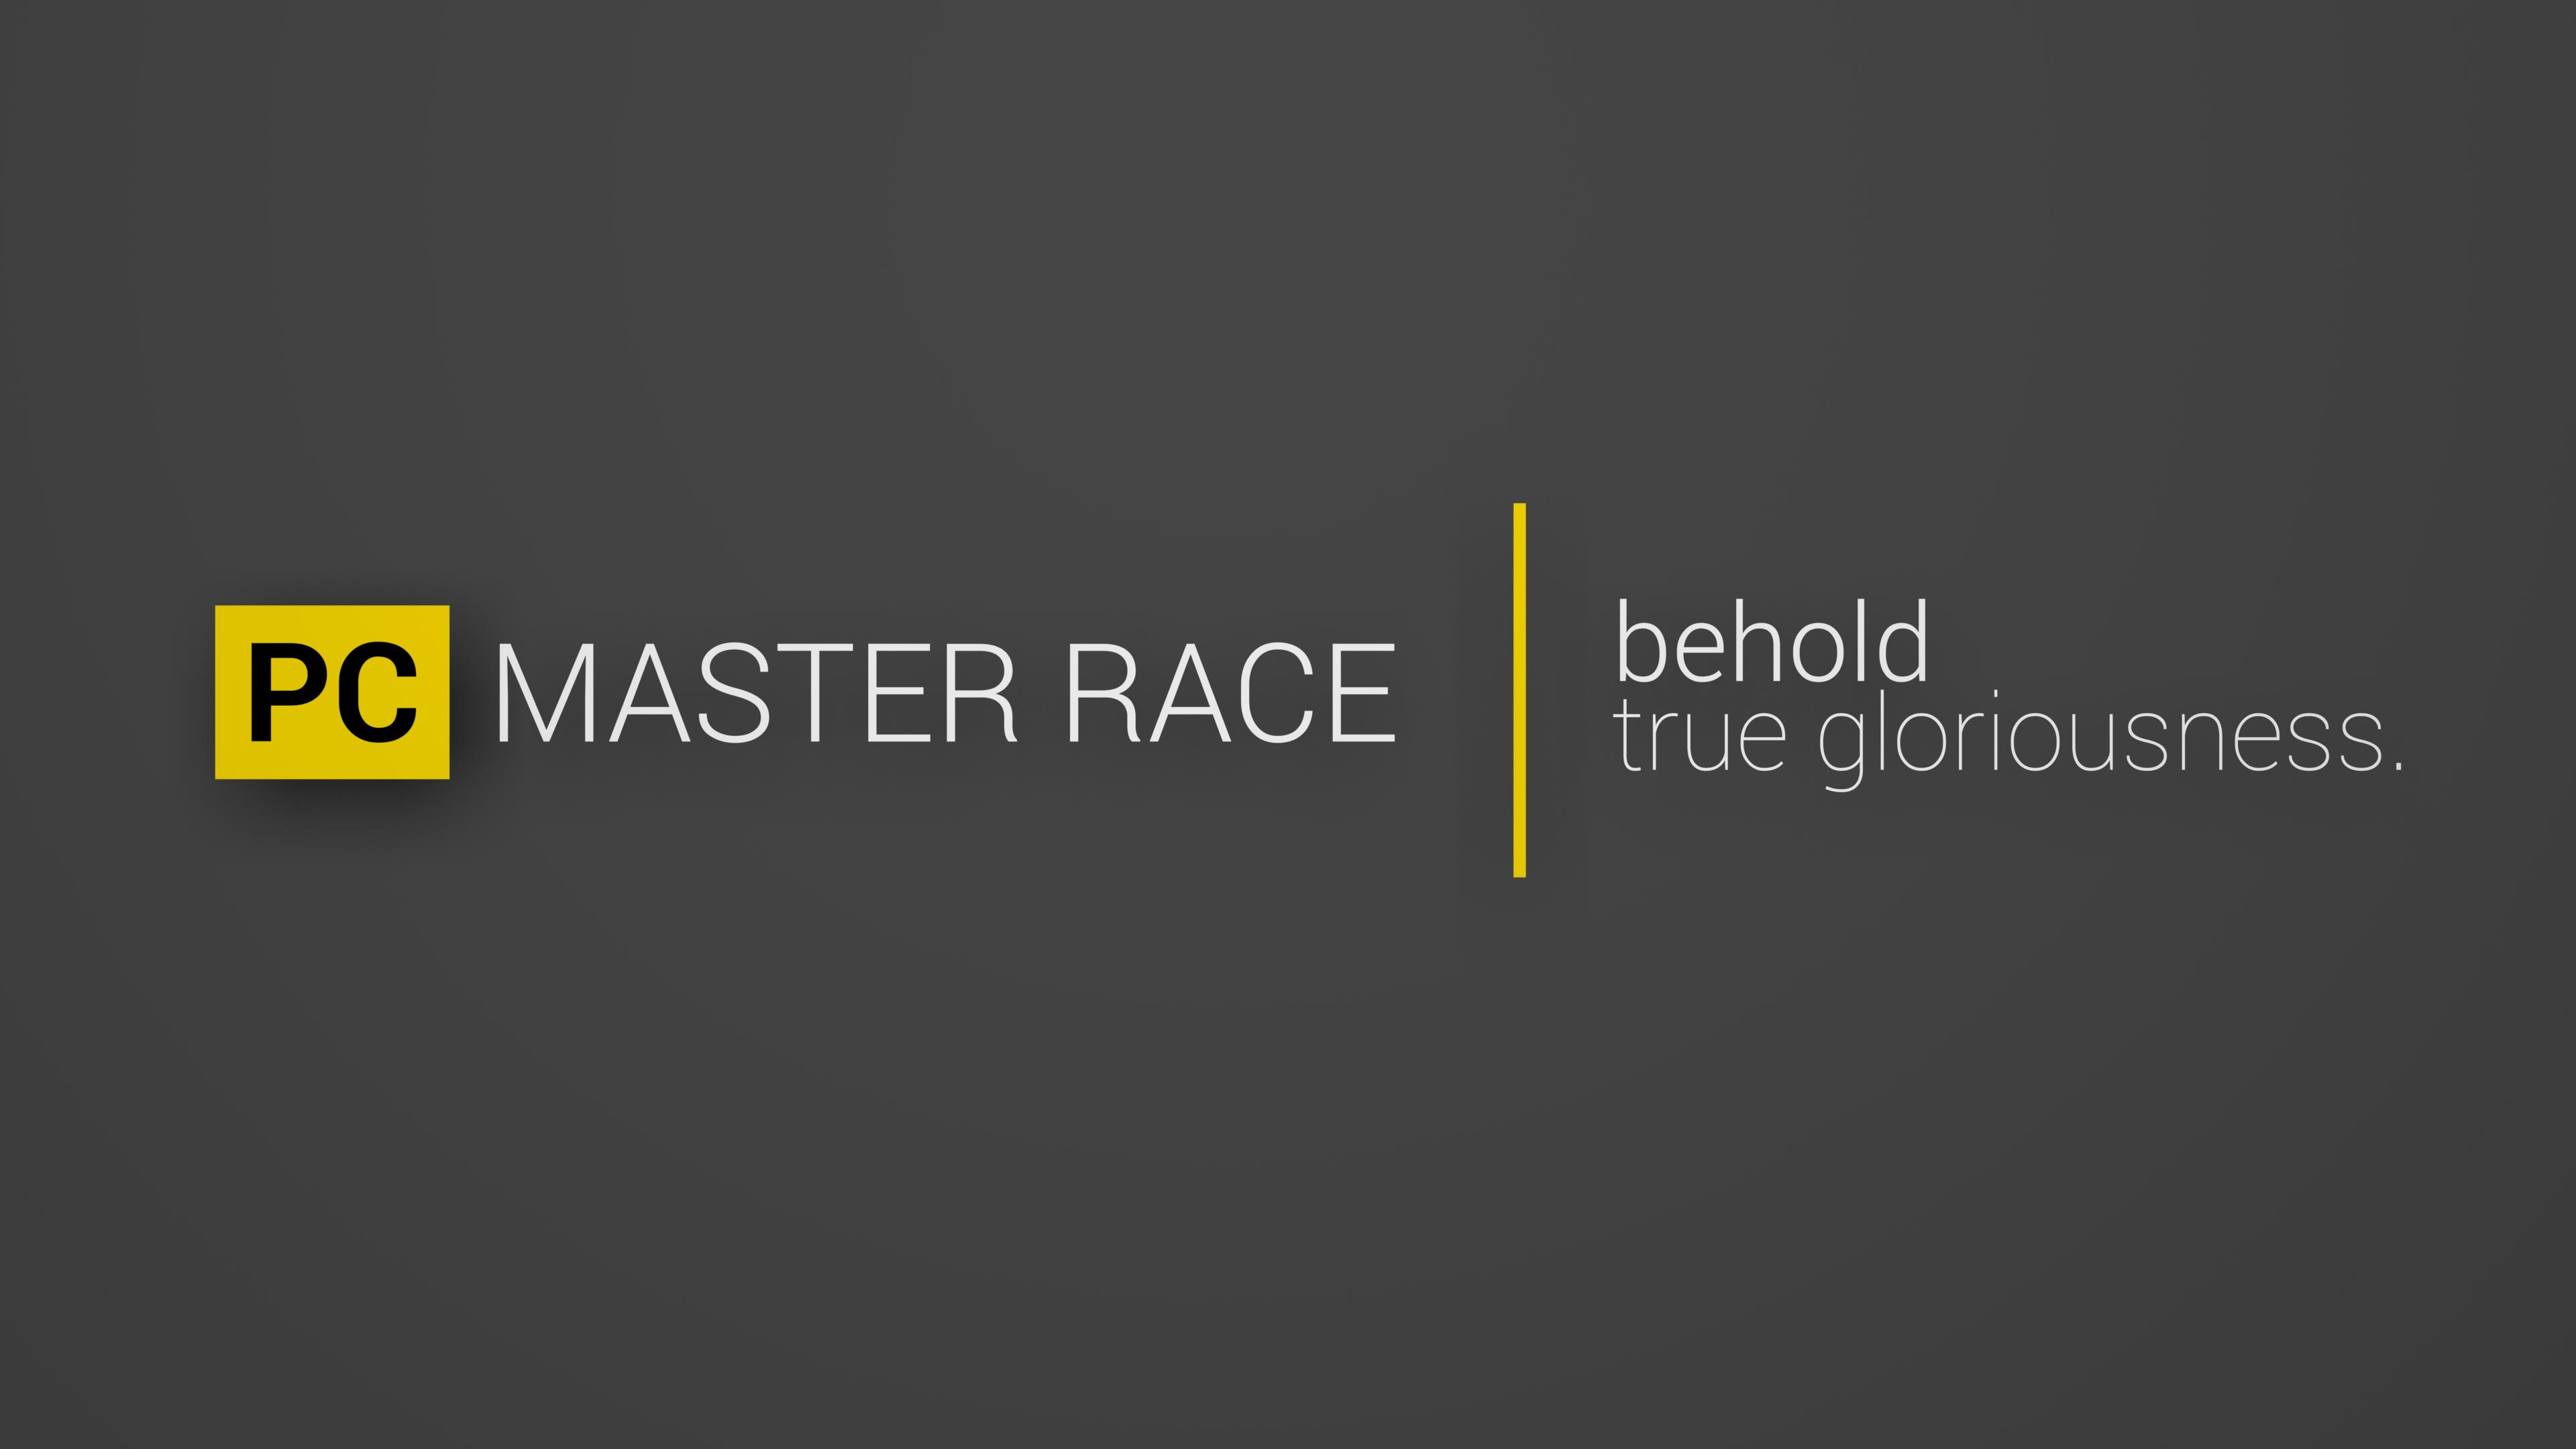 Pc Master Race Wallpaper 1440p